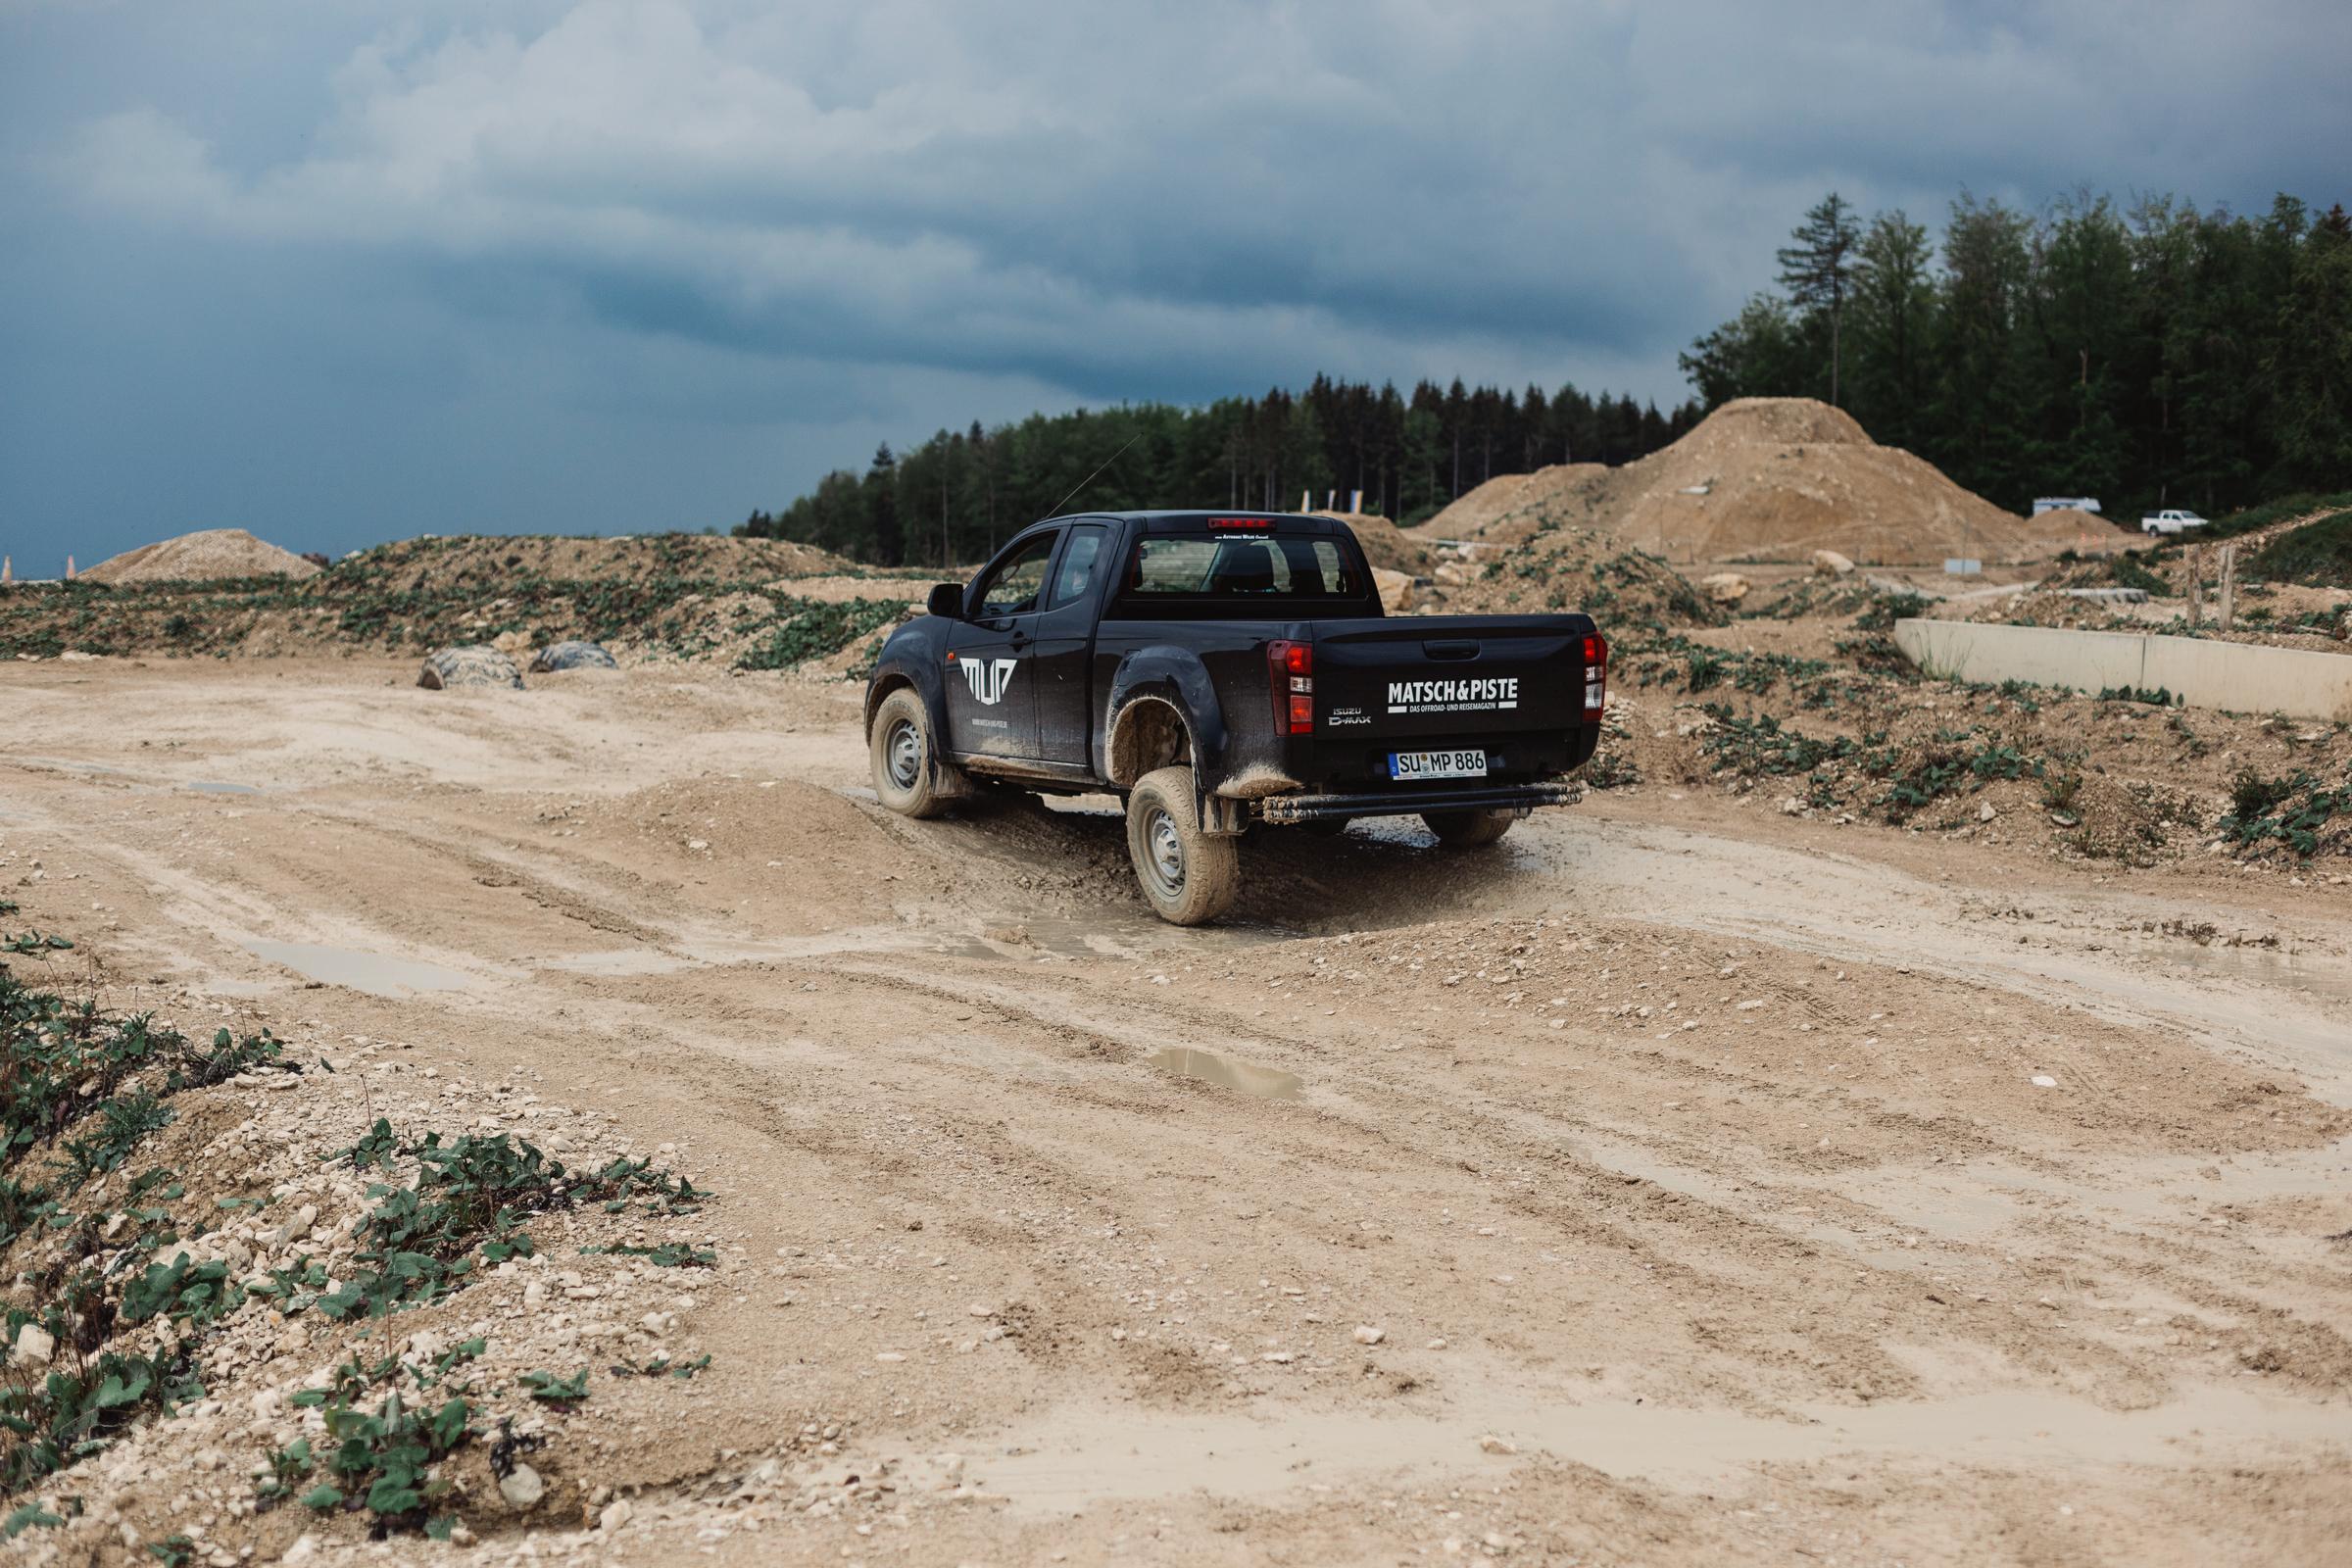 Matsch&Piste Offroad-Training by Quadrofaktum